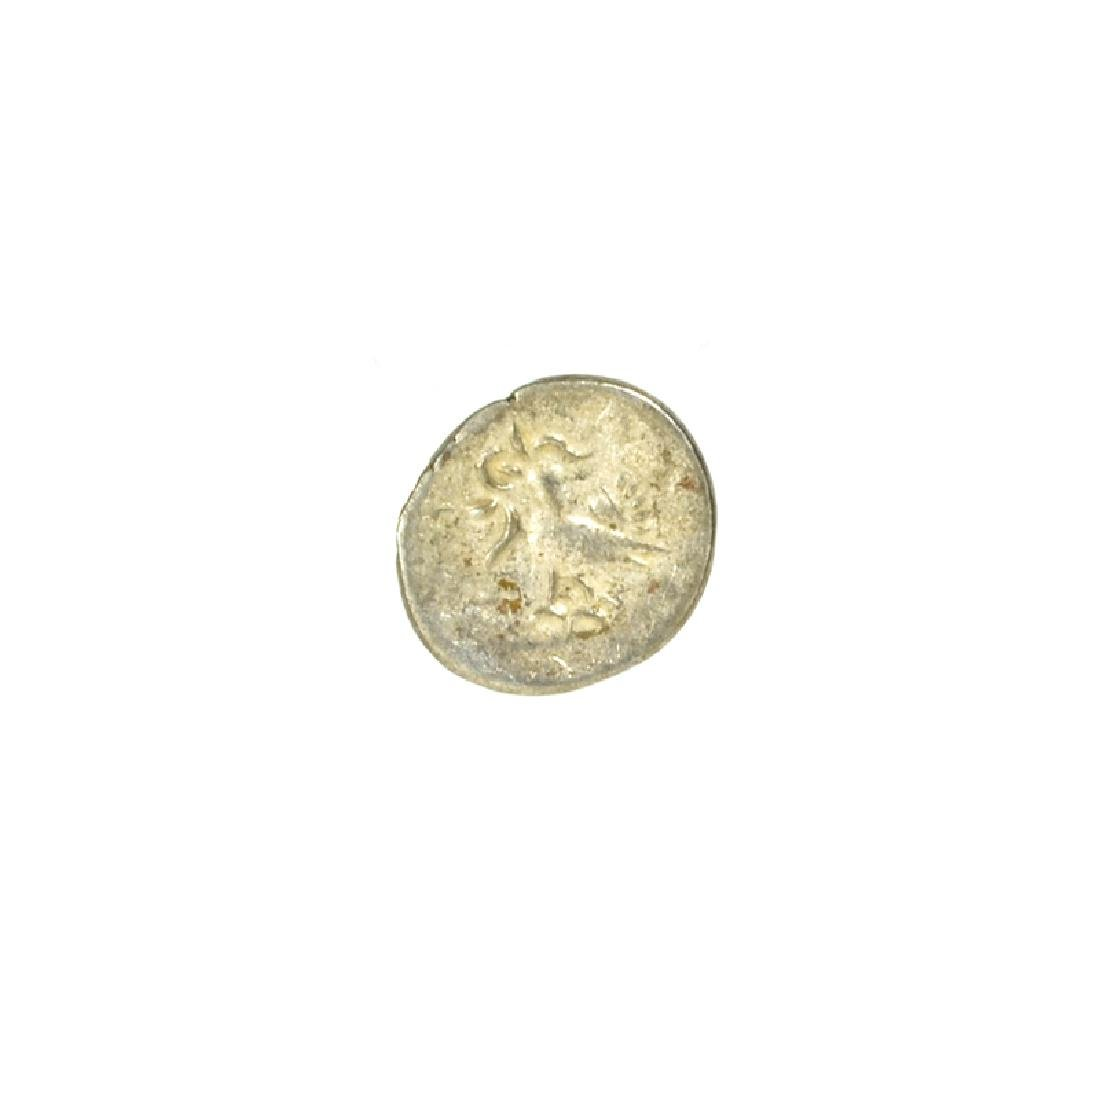 1847 Cambodia Billion 1/8 Tical Hamza Bird Facing Left,